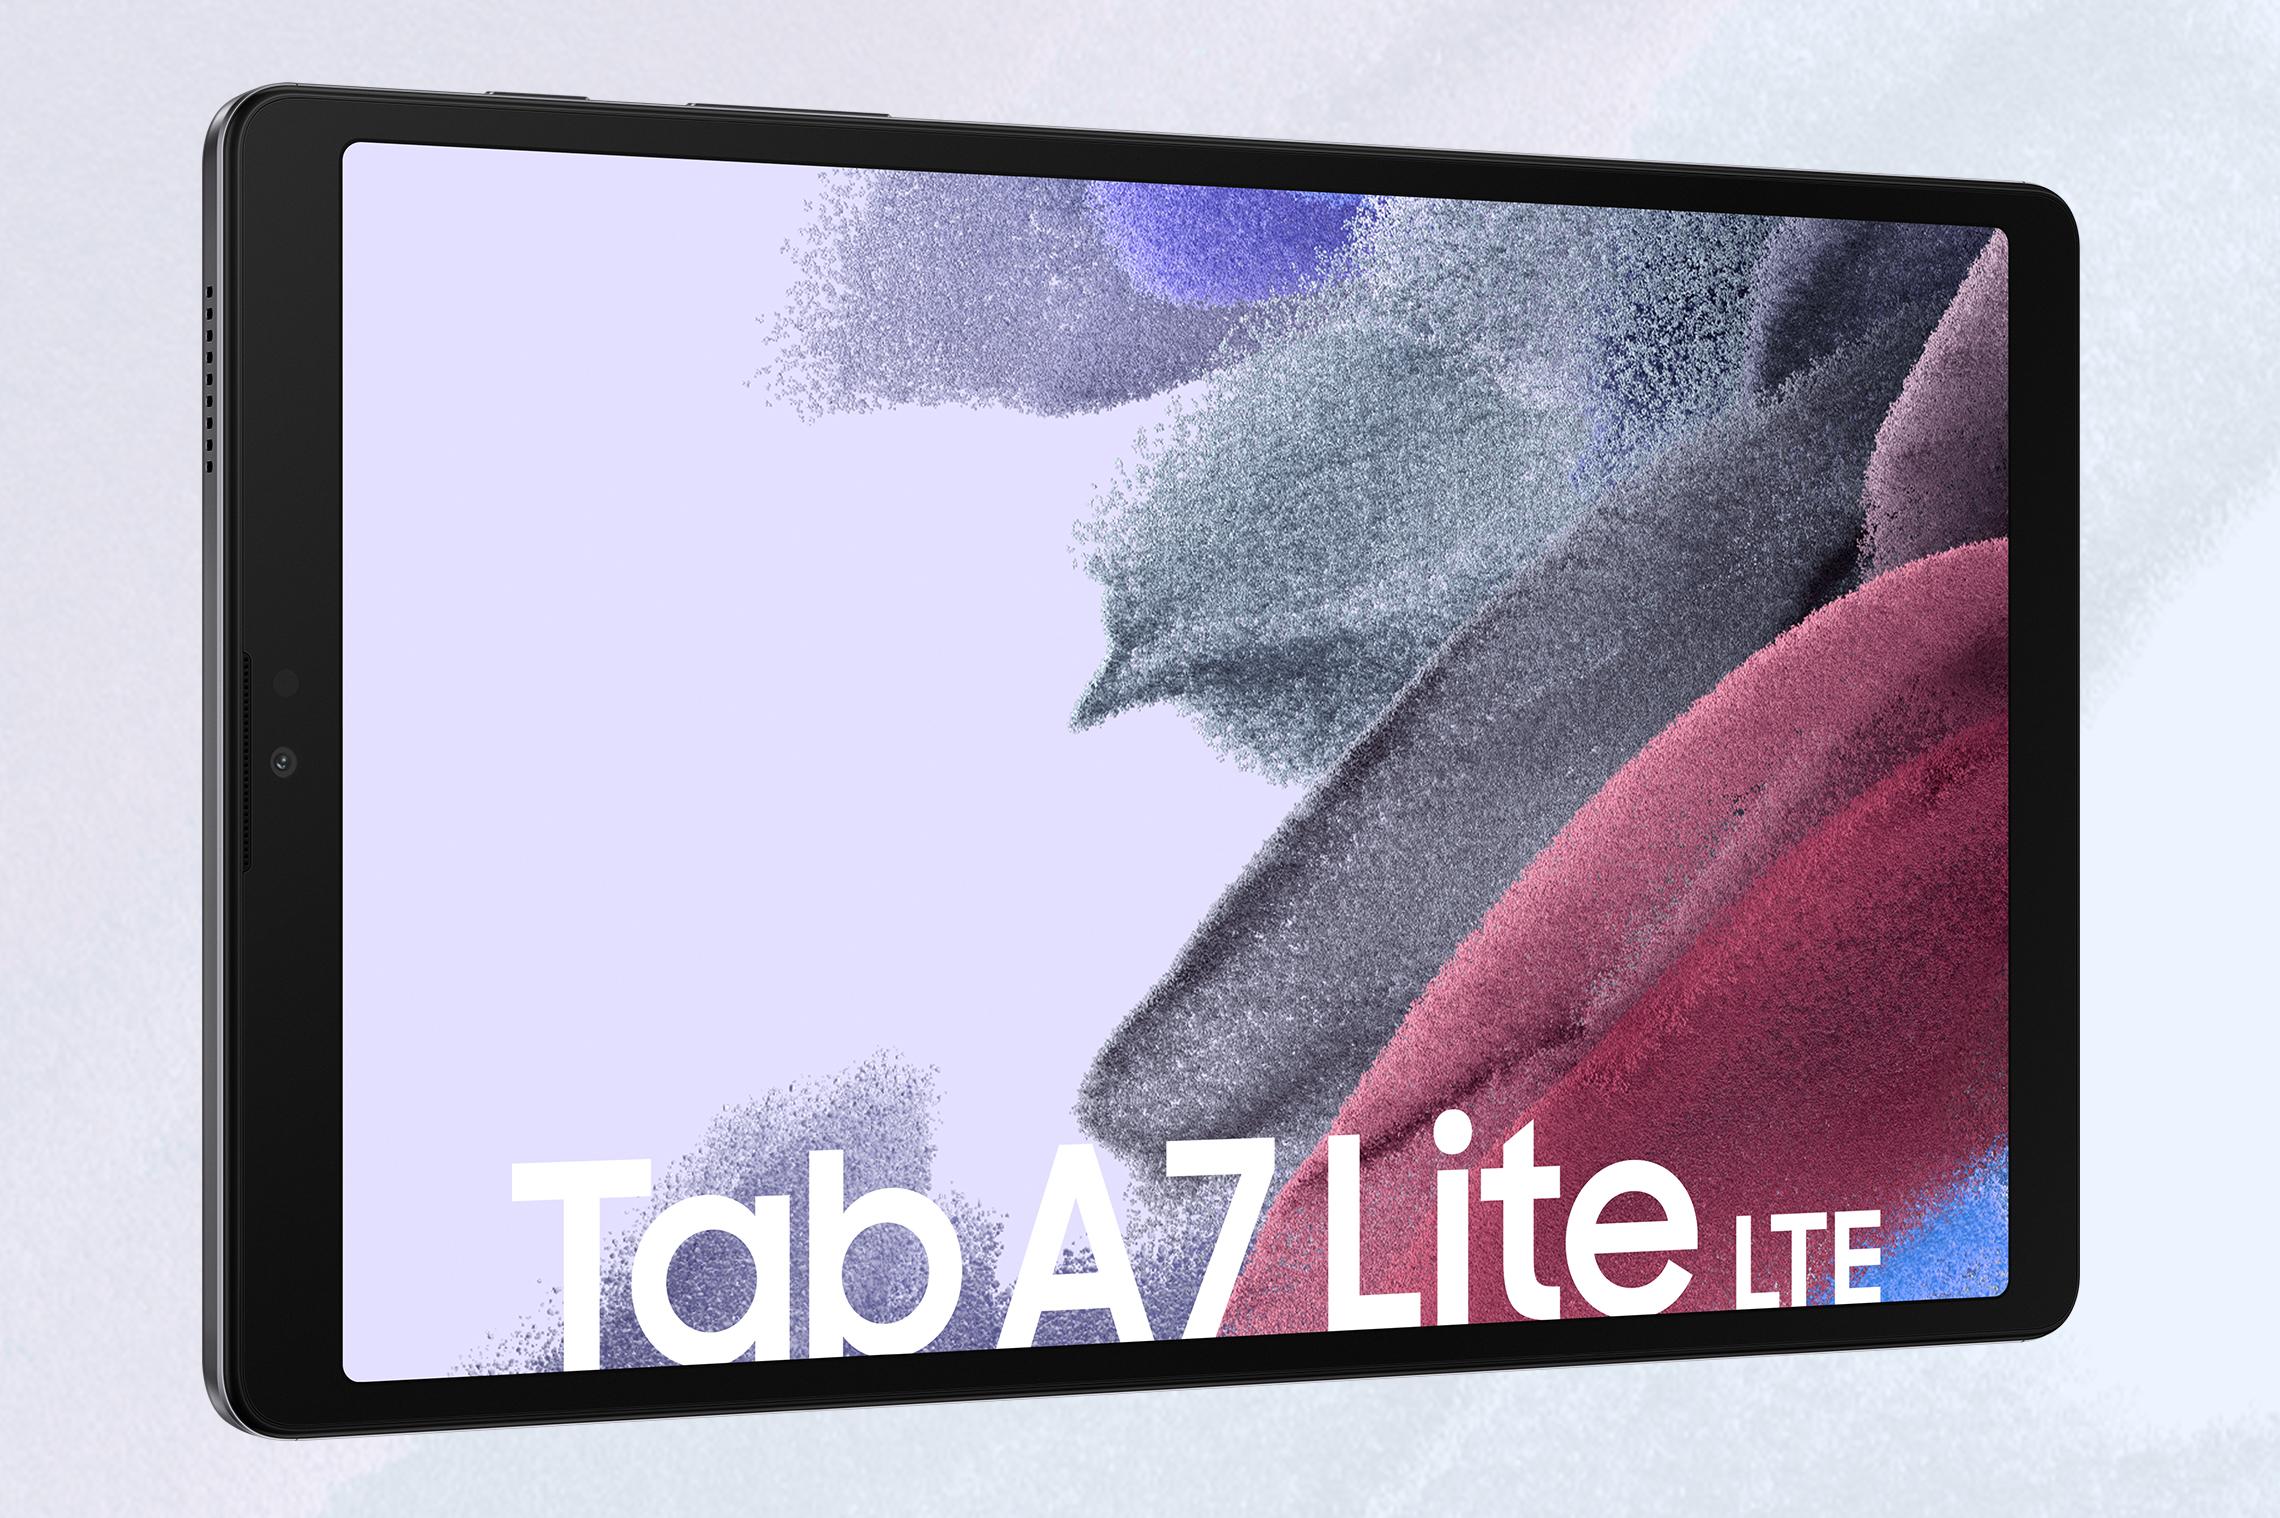 Samsung Galaxy Tab A7 Lite: Was kann das Einsteiger-Tablet?